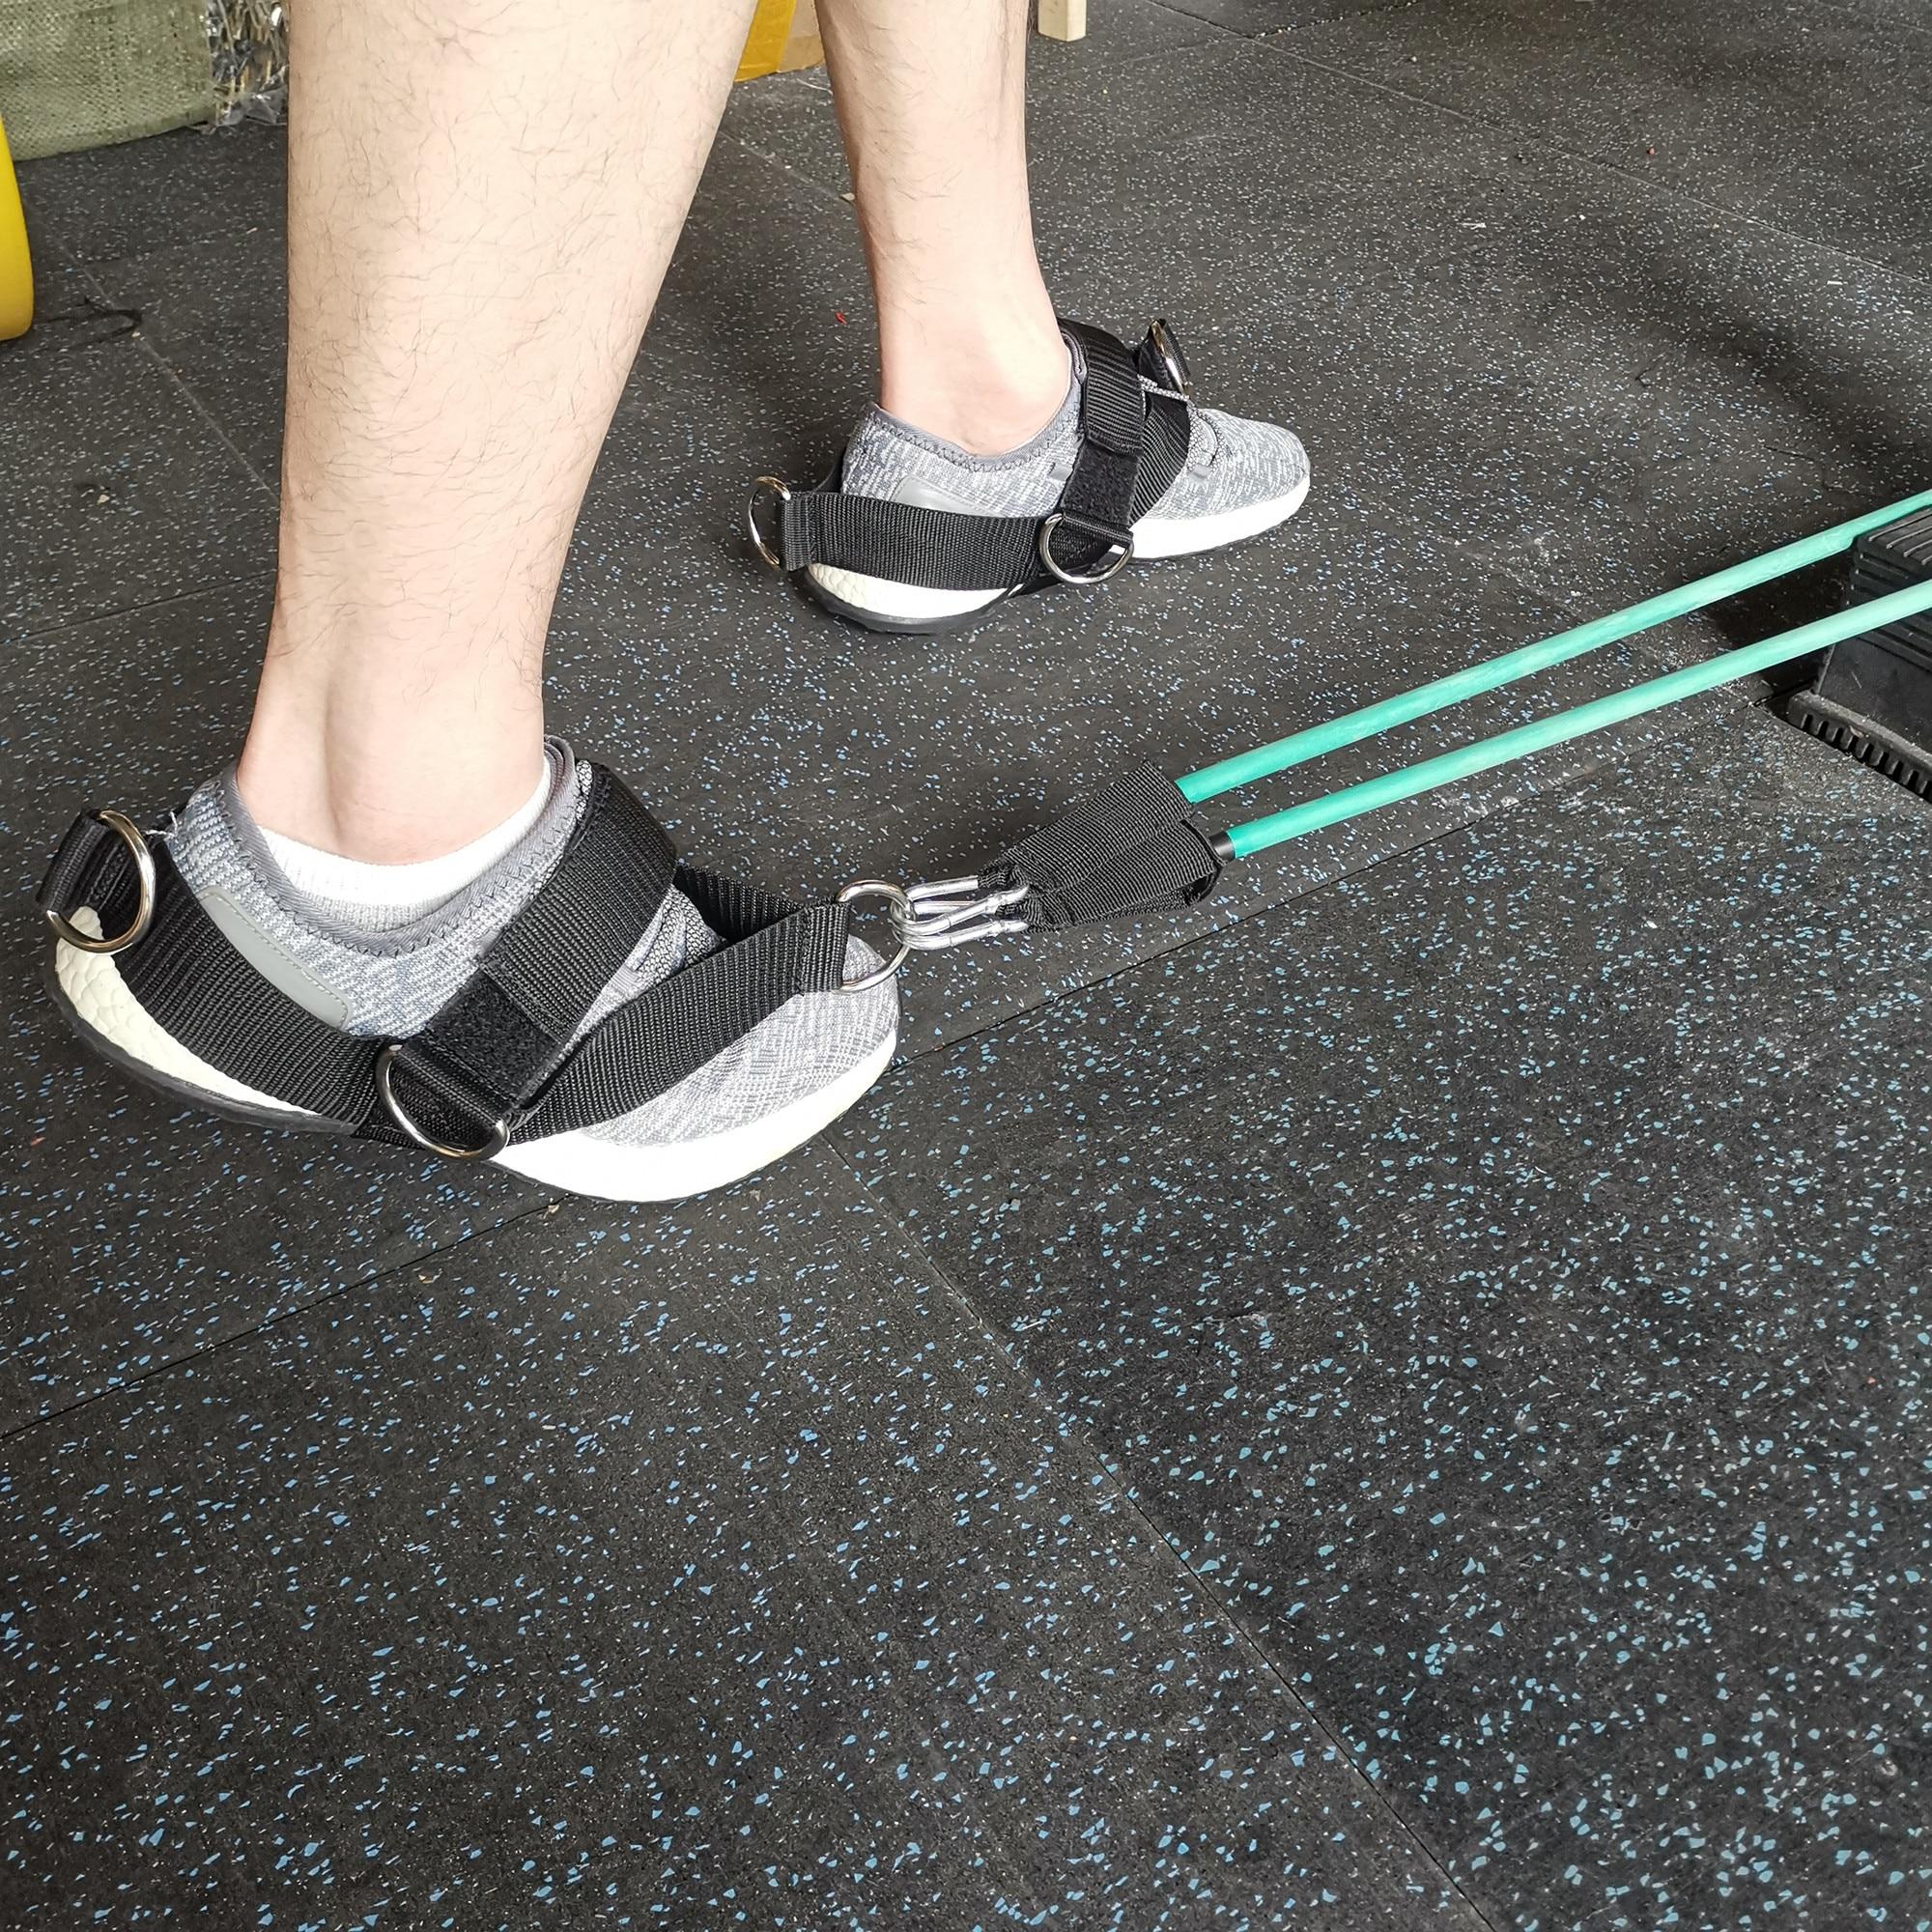 ORANGE  5-D Ring Foot Strap Cable Gym Machine Attch Glute,Donkey Kickbacks GLUTE